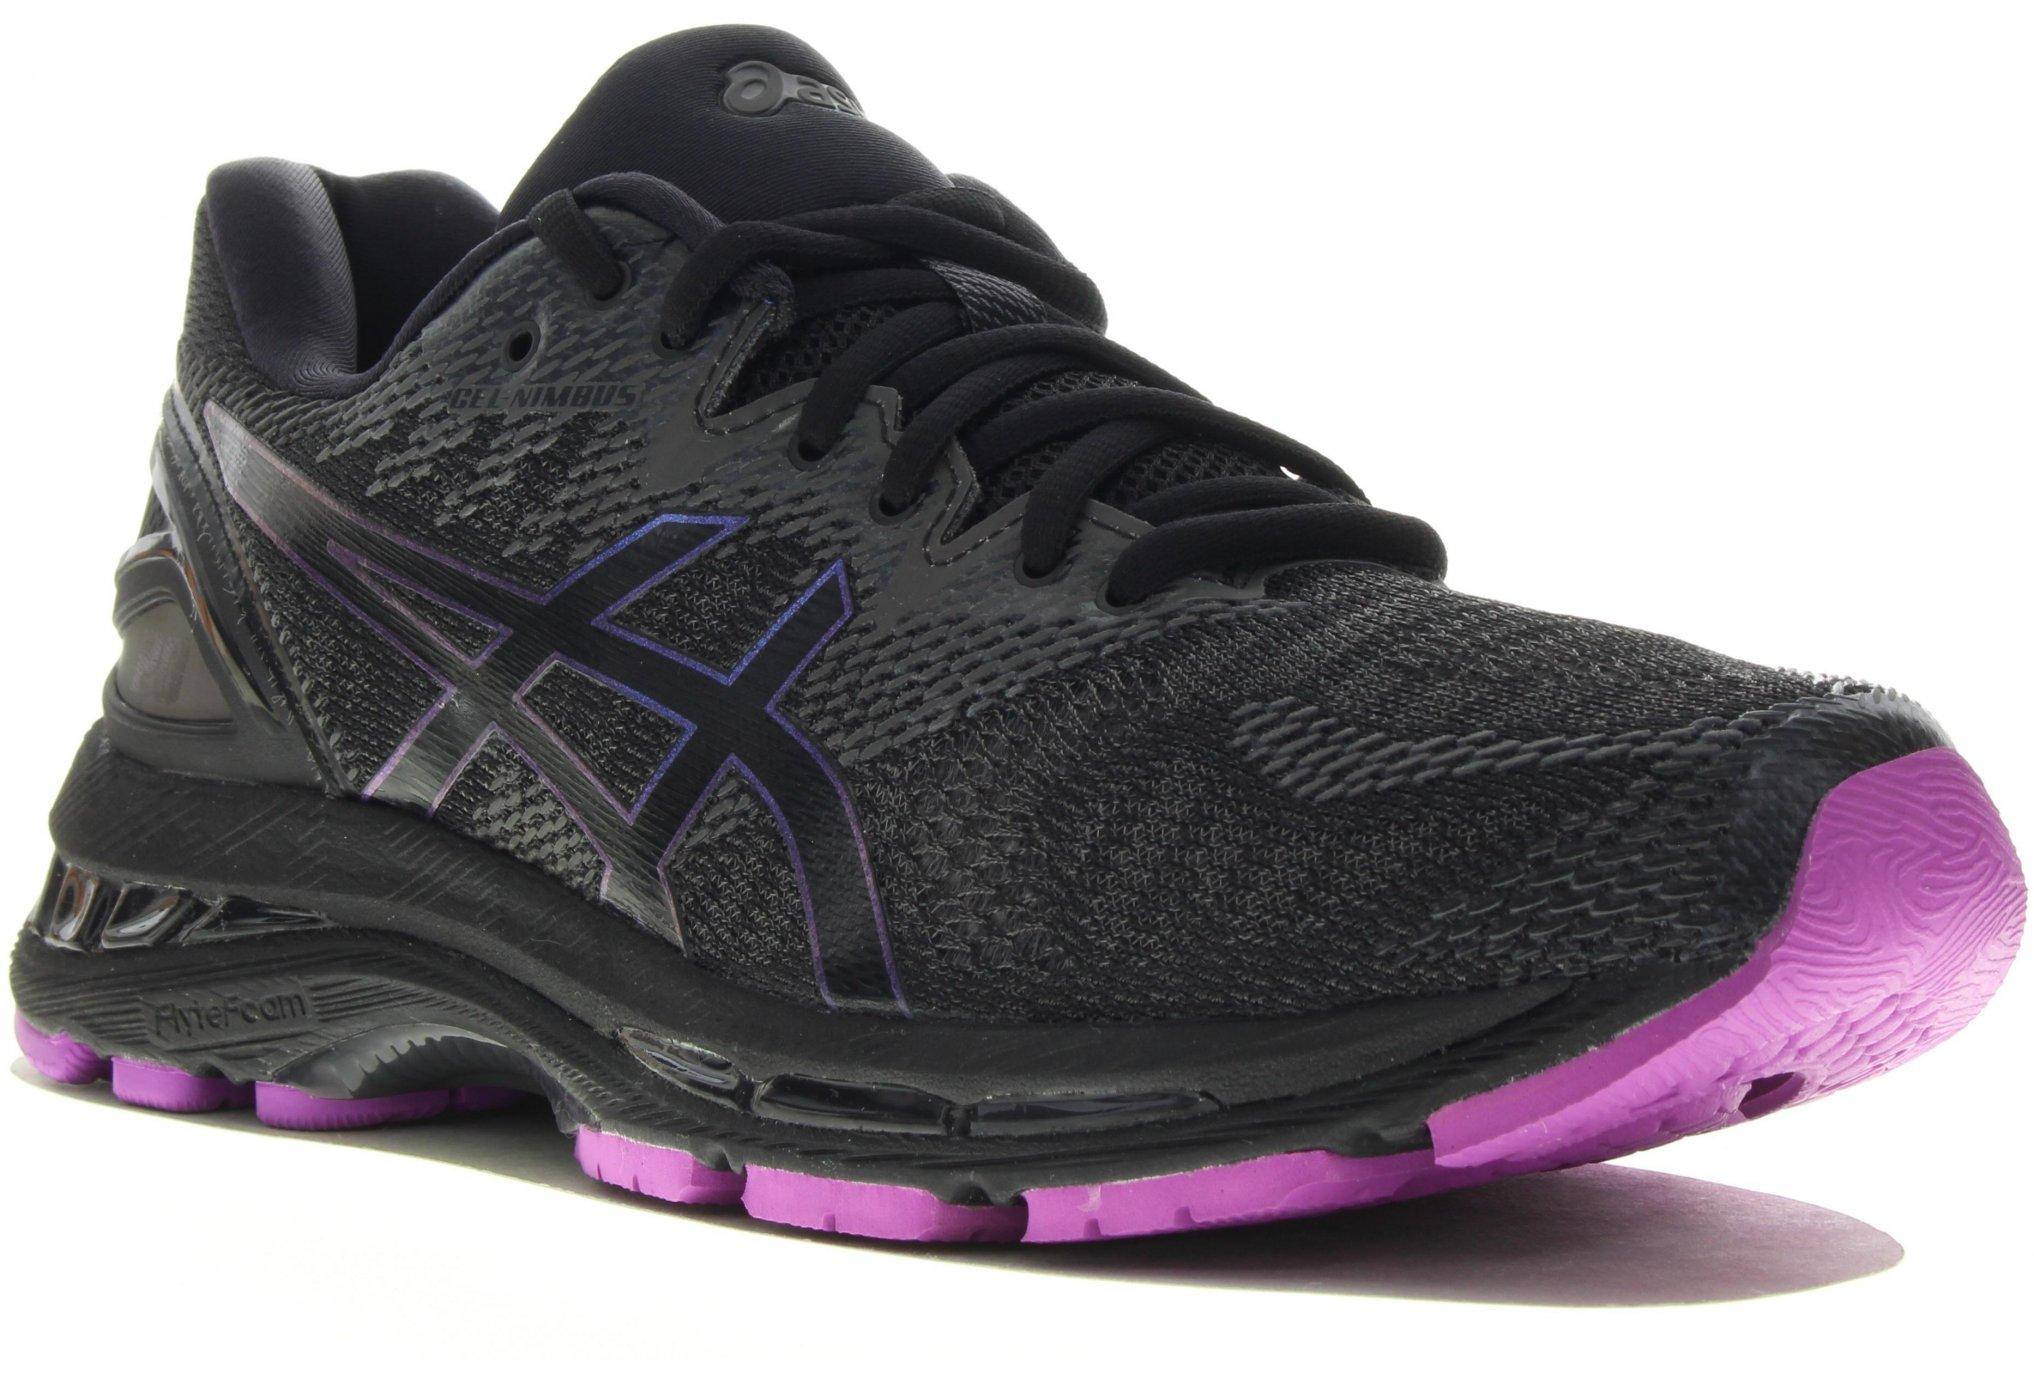 Asics Gel-Nimbus 20 Expert W Diététique Chaussures femme